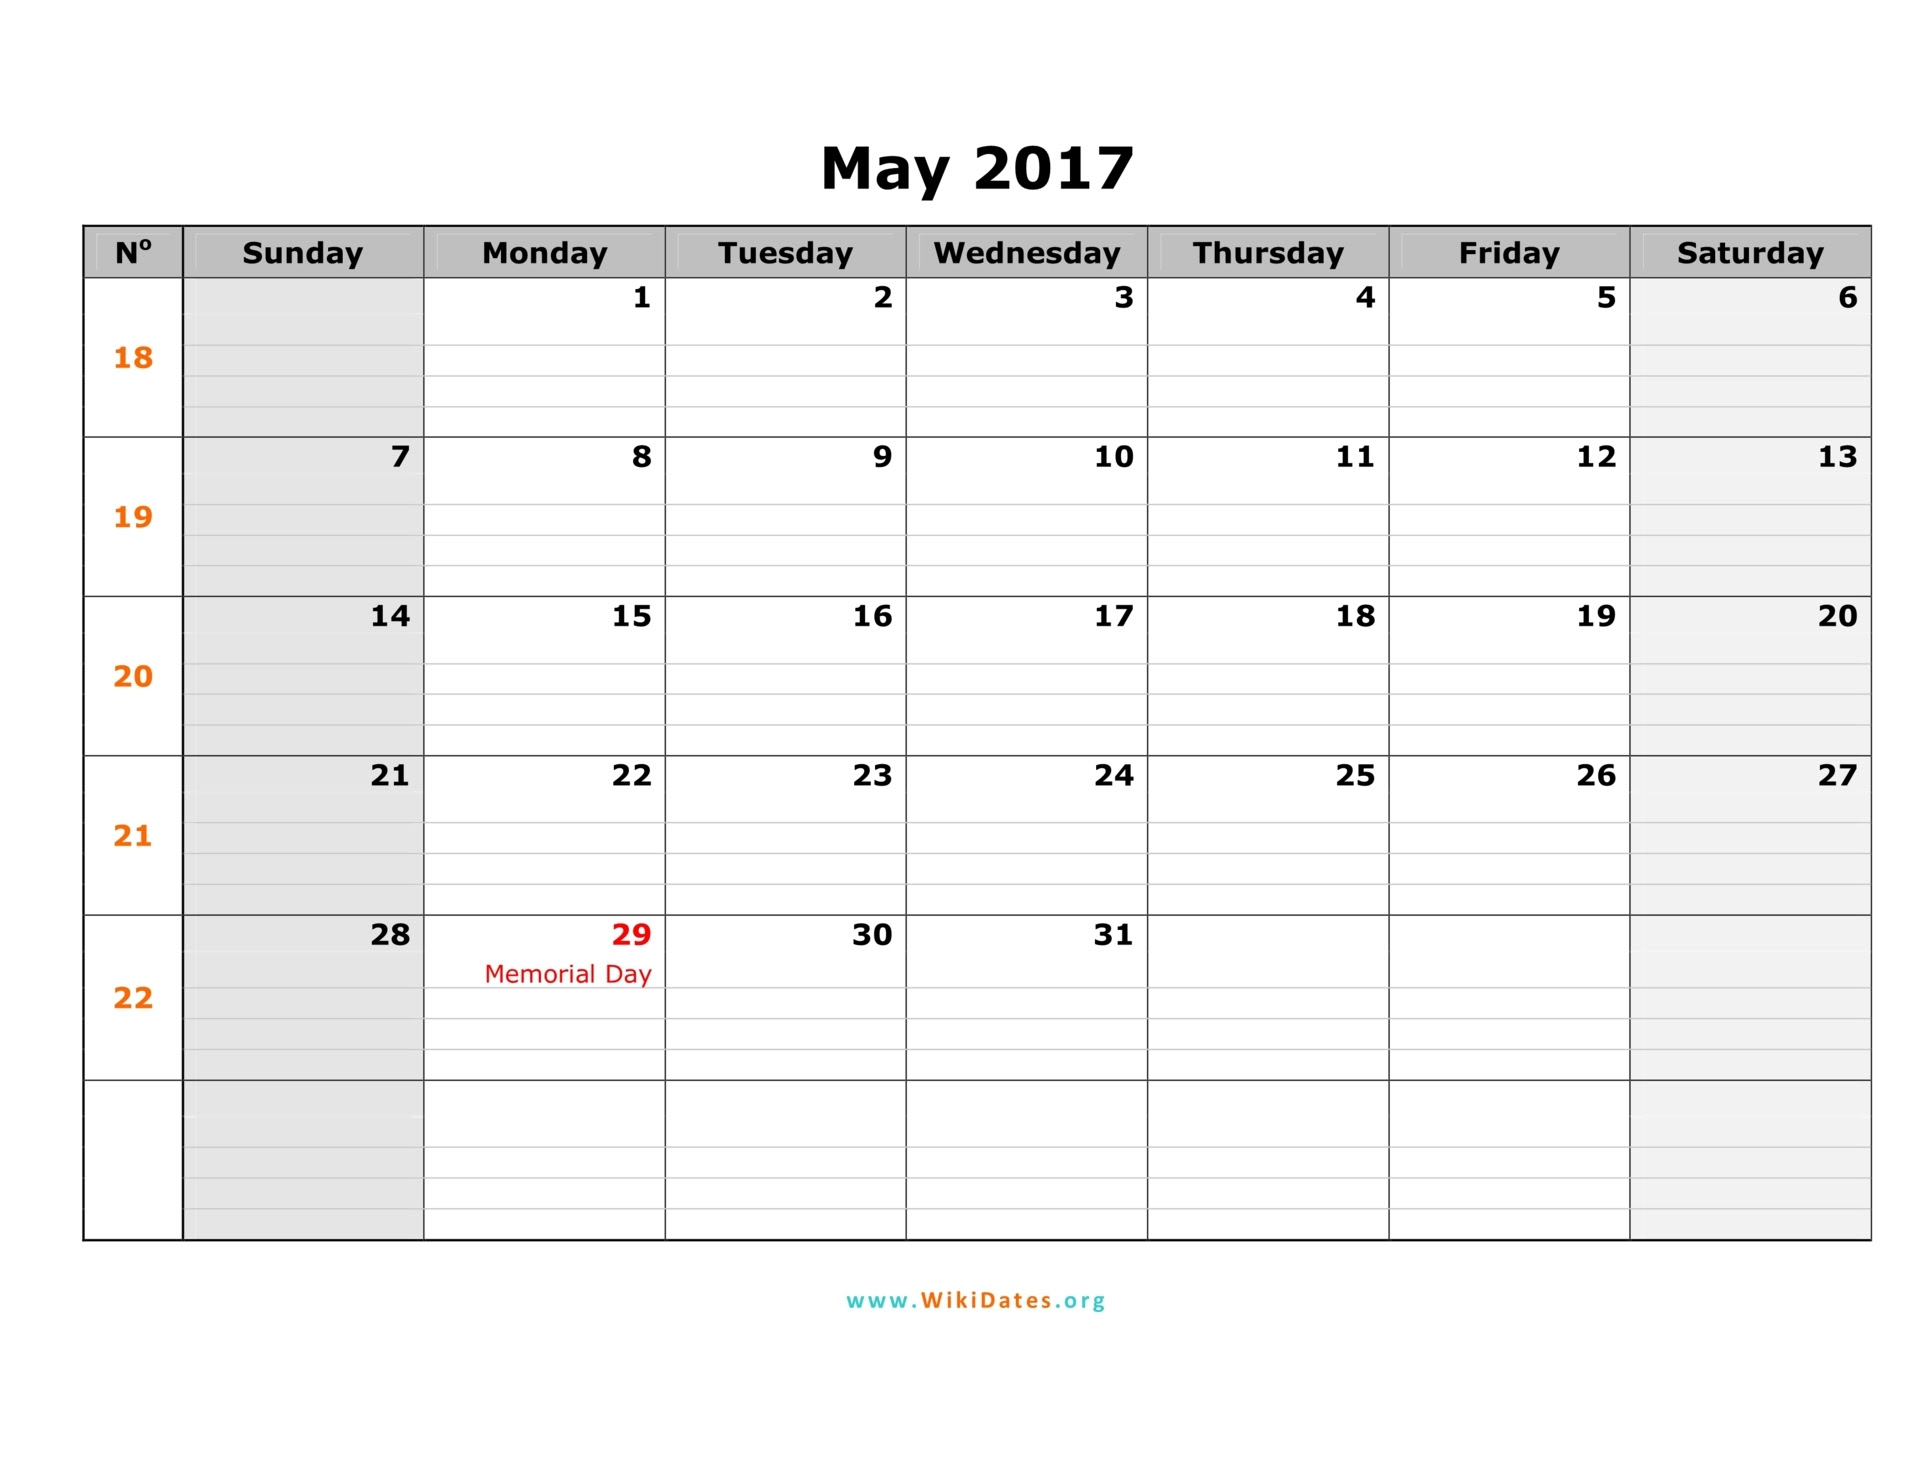 May 2017 Calendar Editable | free calendar 2017